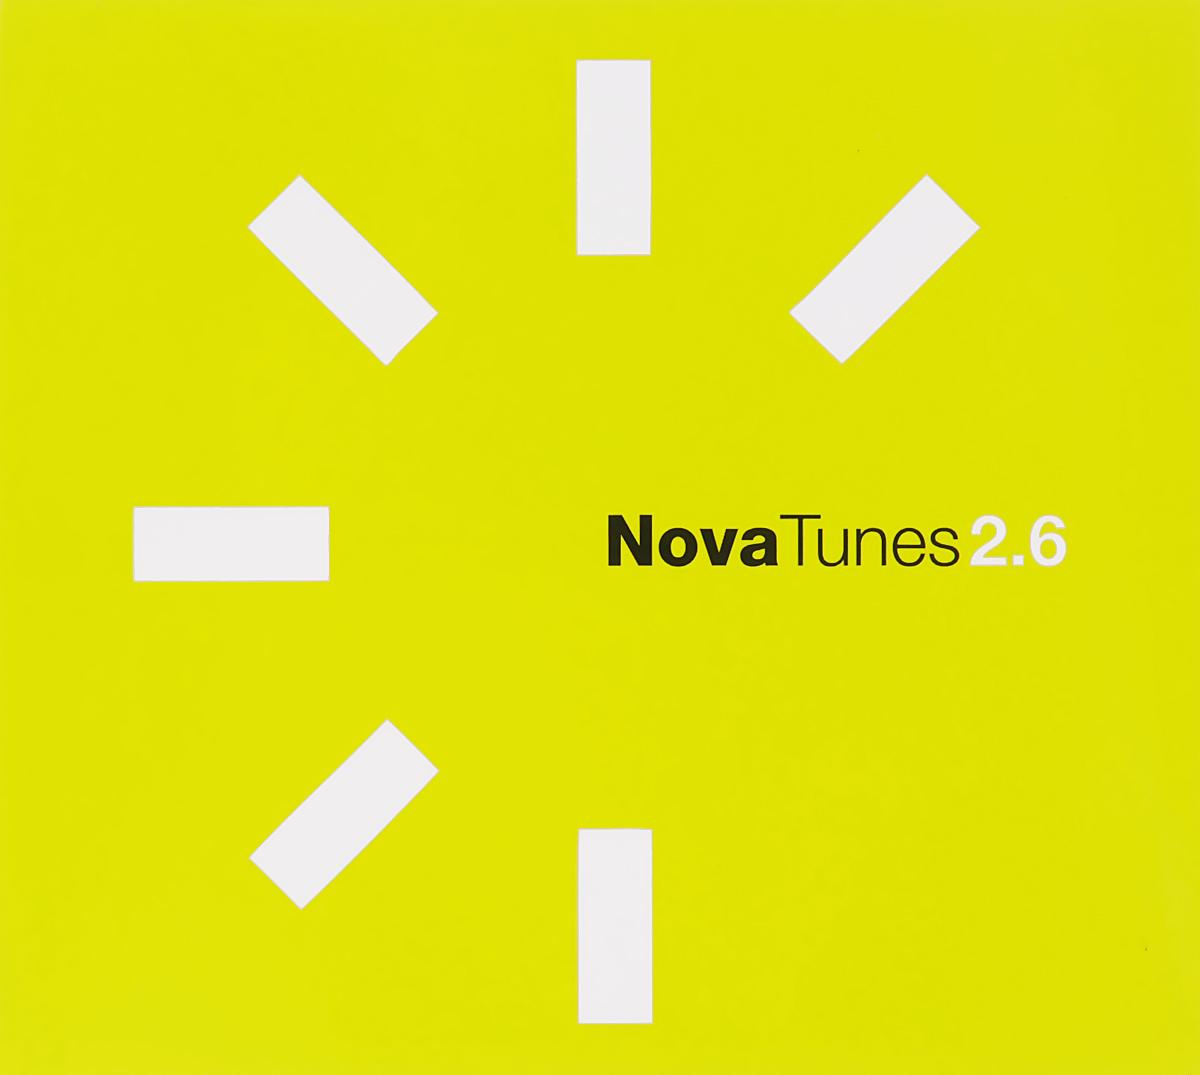 Nova Tunes 2.6